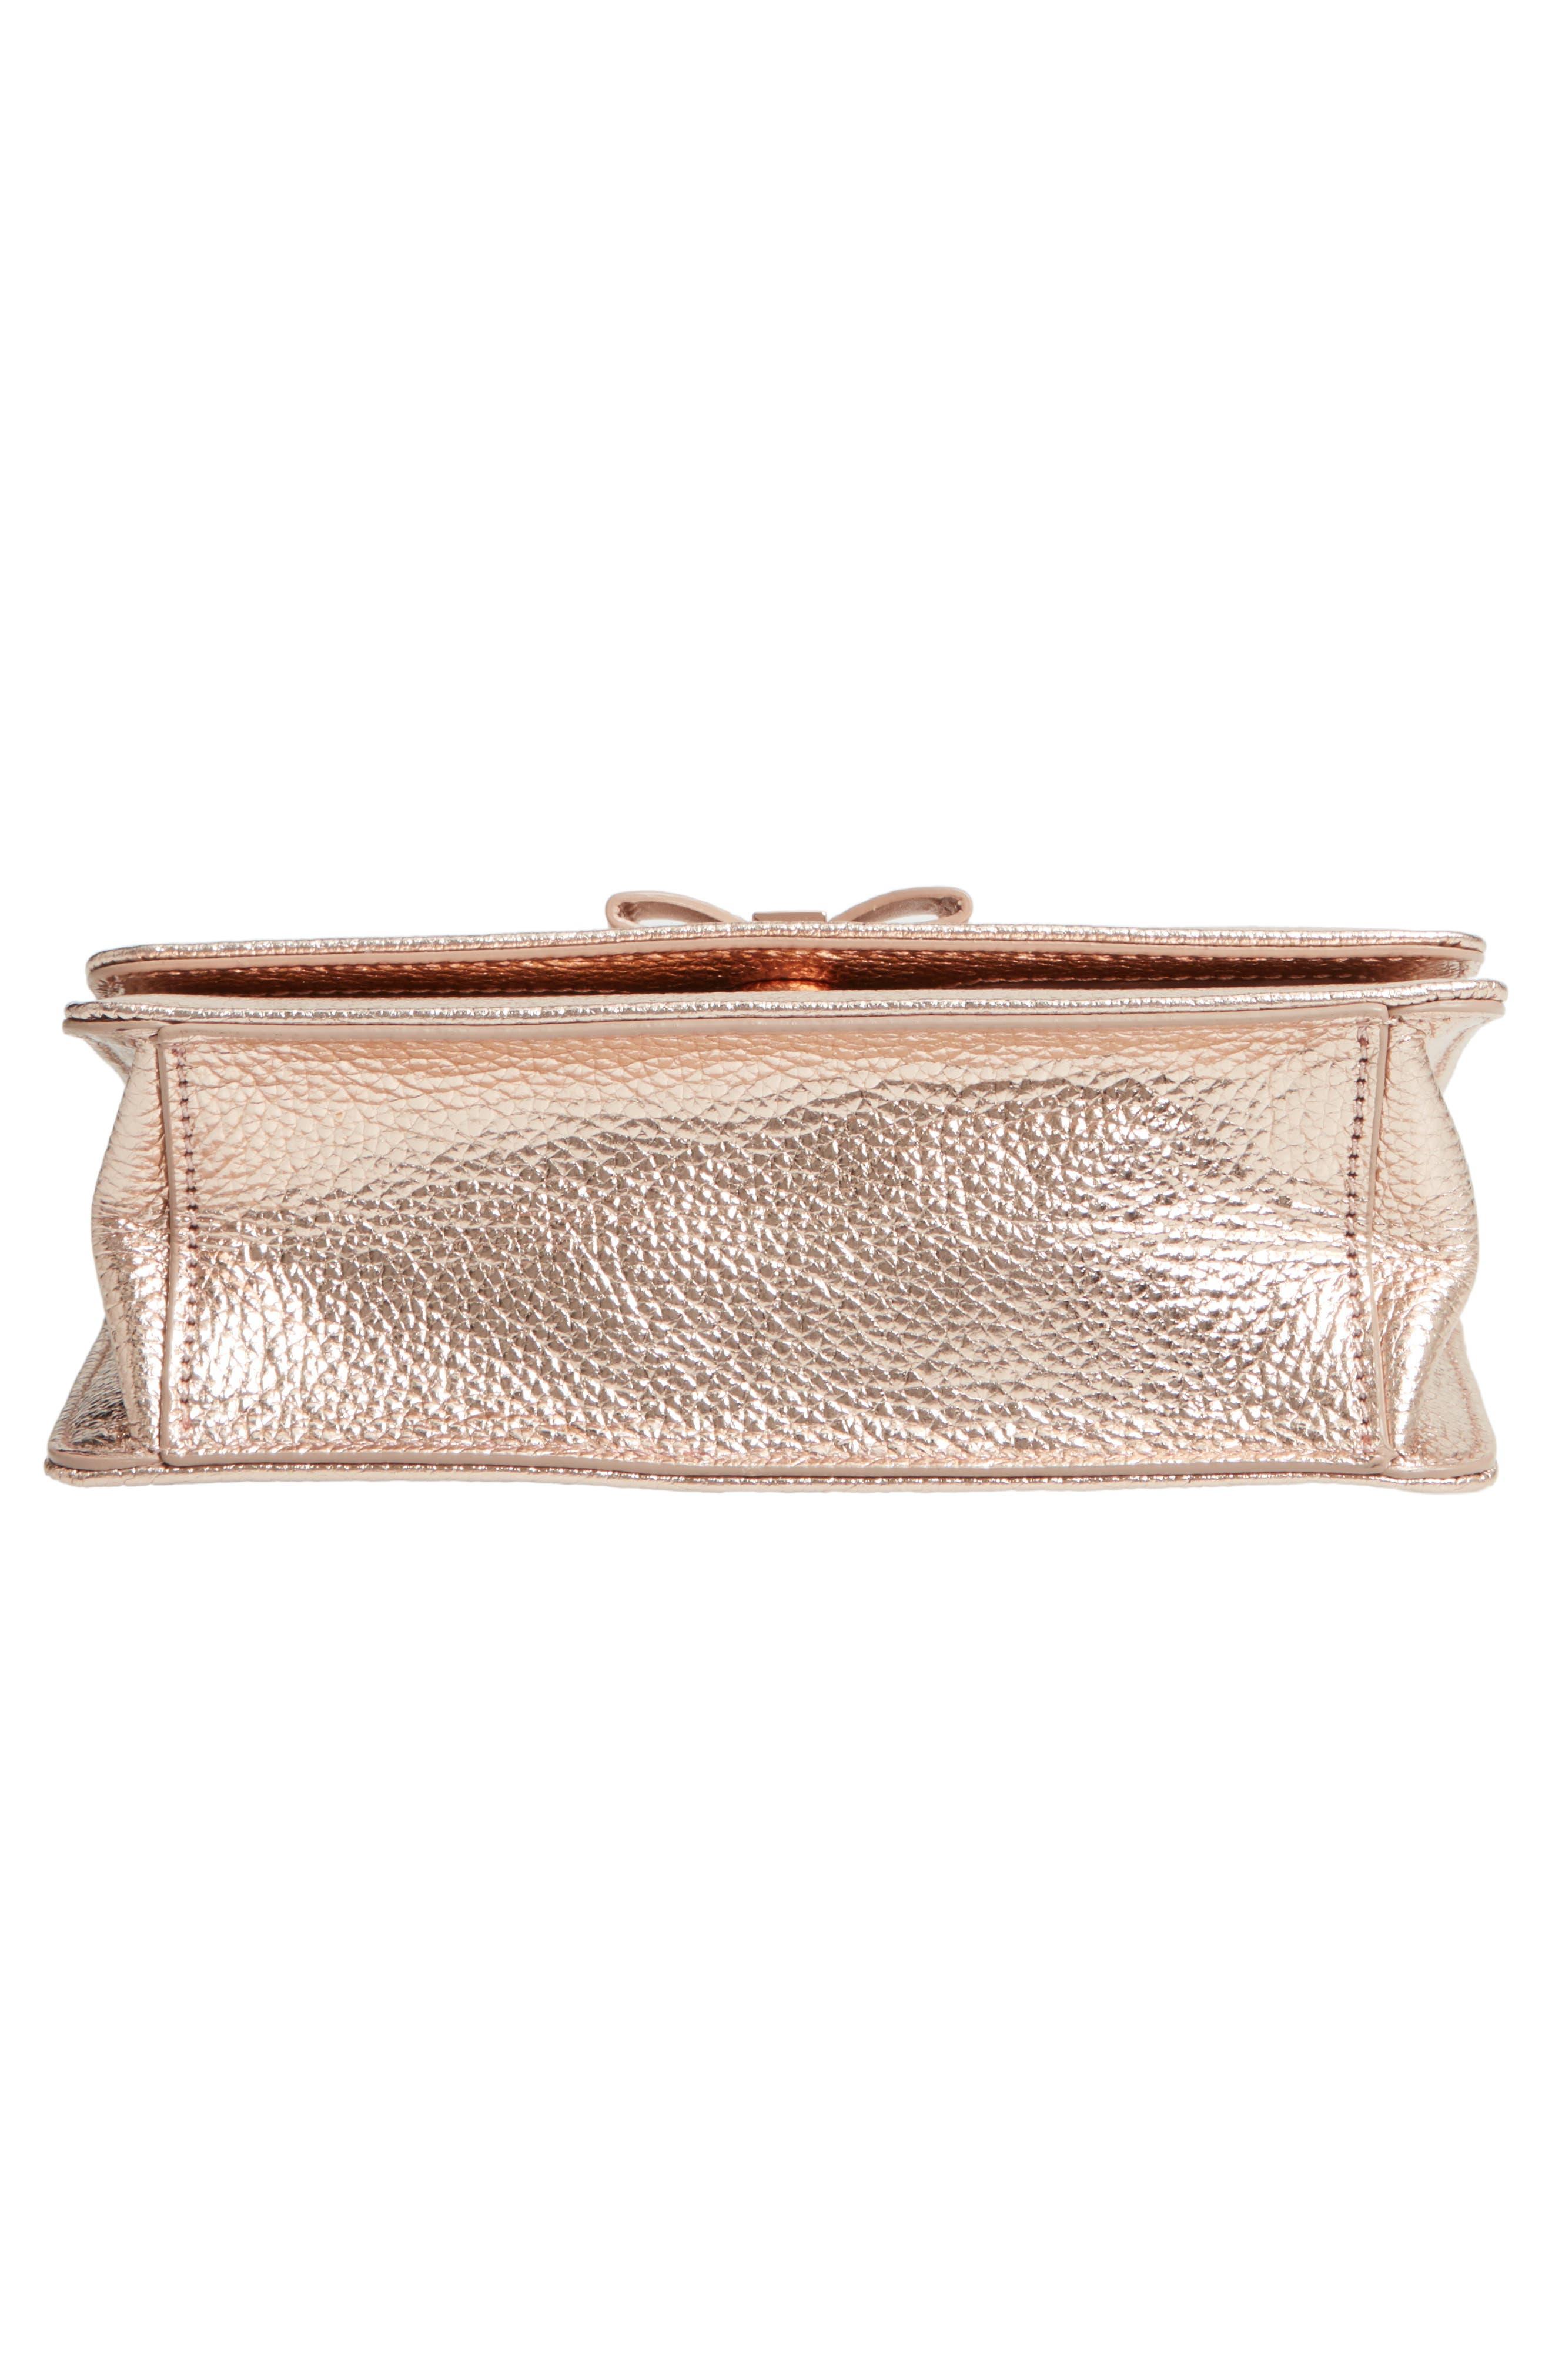 Micro Leather Crossbody Bag,                             Alternate thumbnail 6, color,                             712